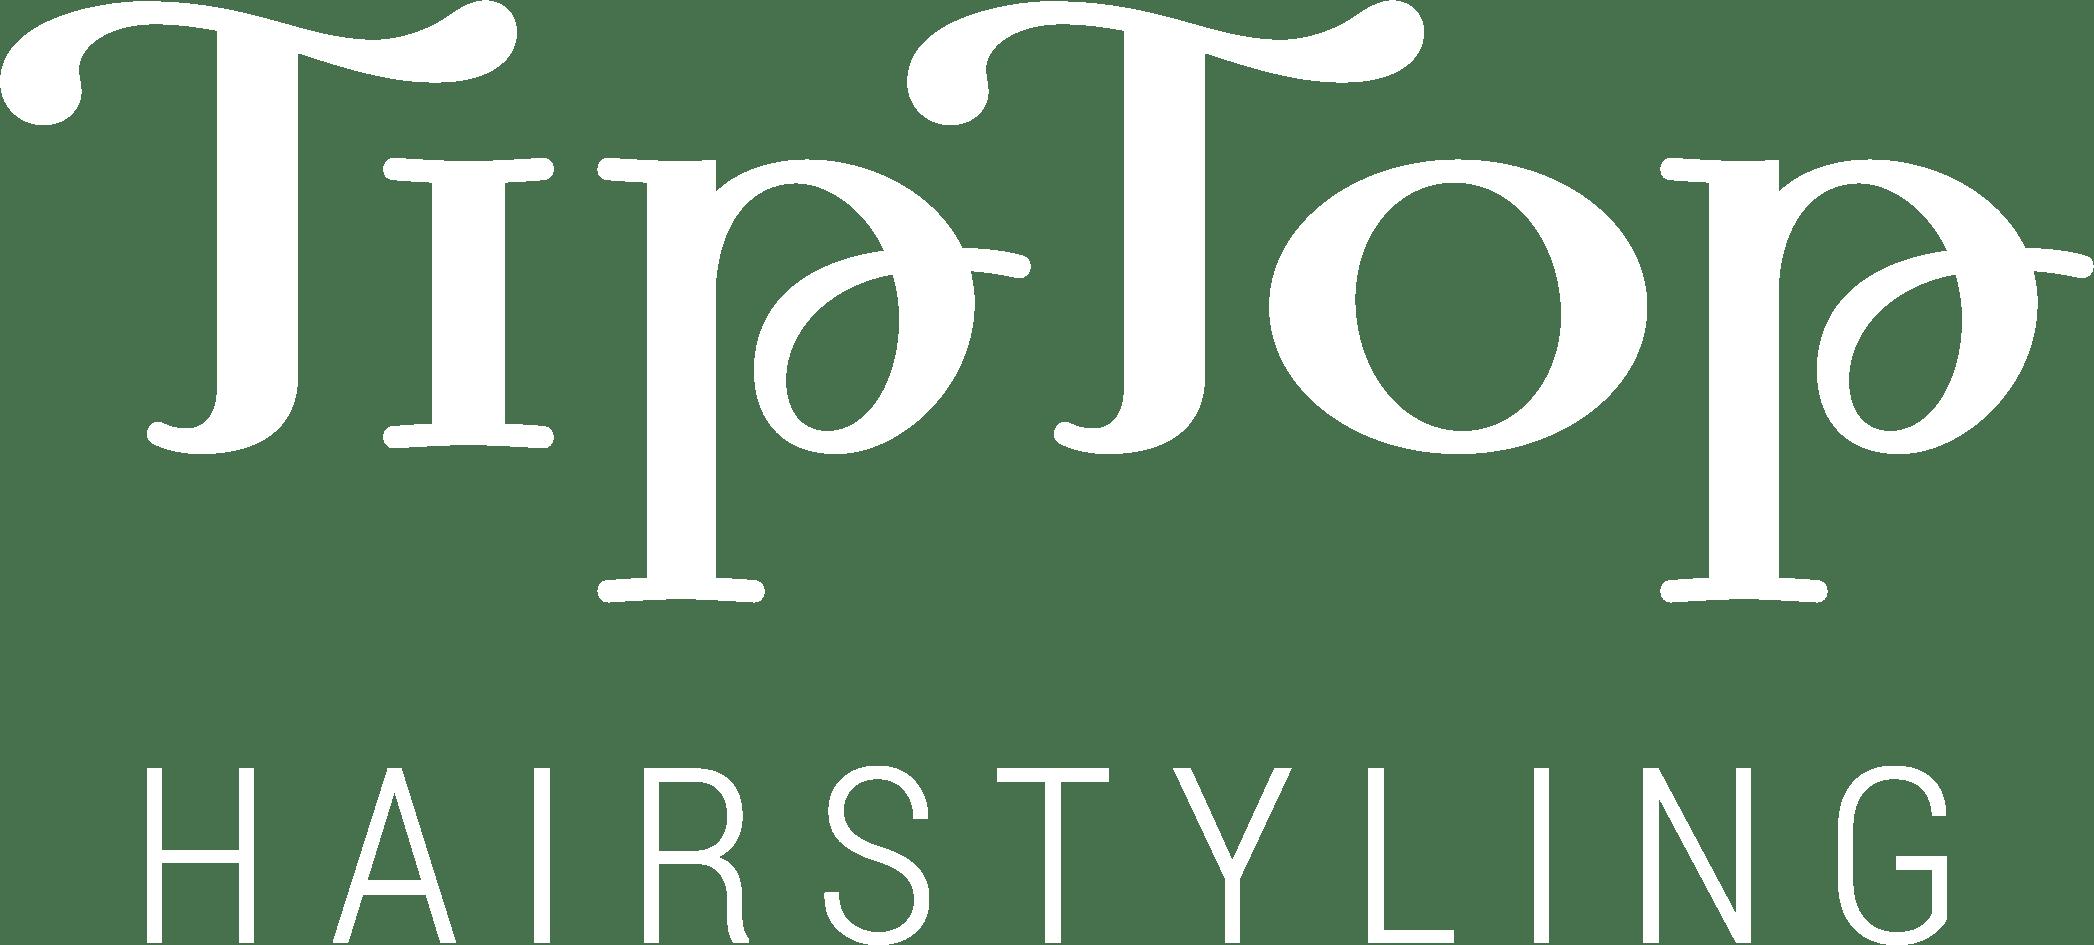 Haarwerksalon - Kapsalon - Visagie in Vollenhove Emmeloord en omstreken